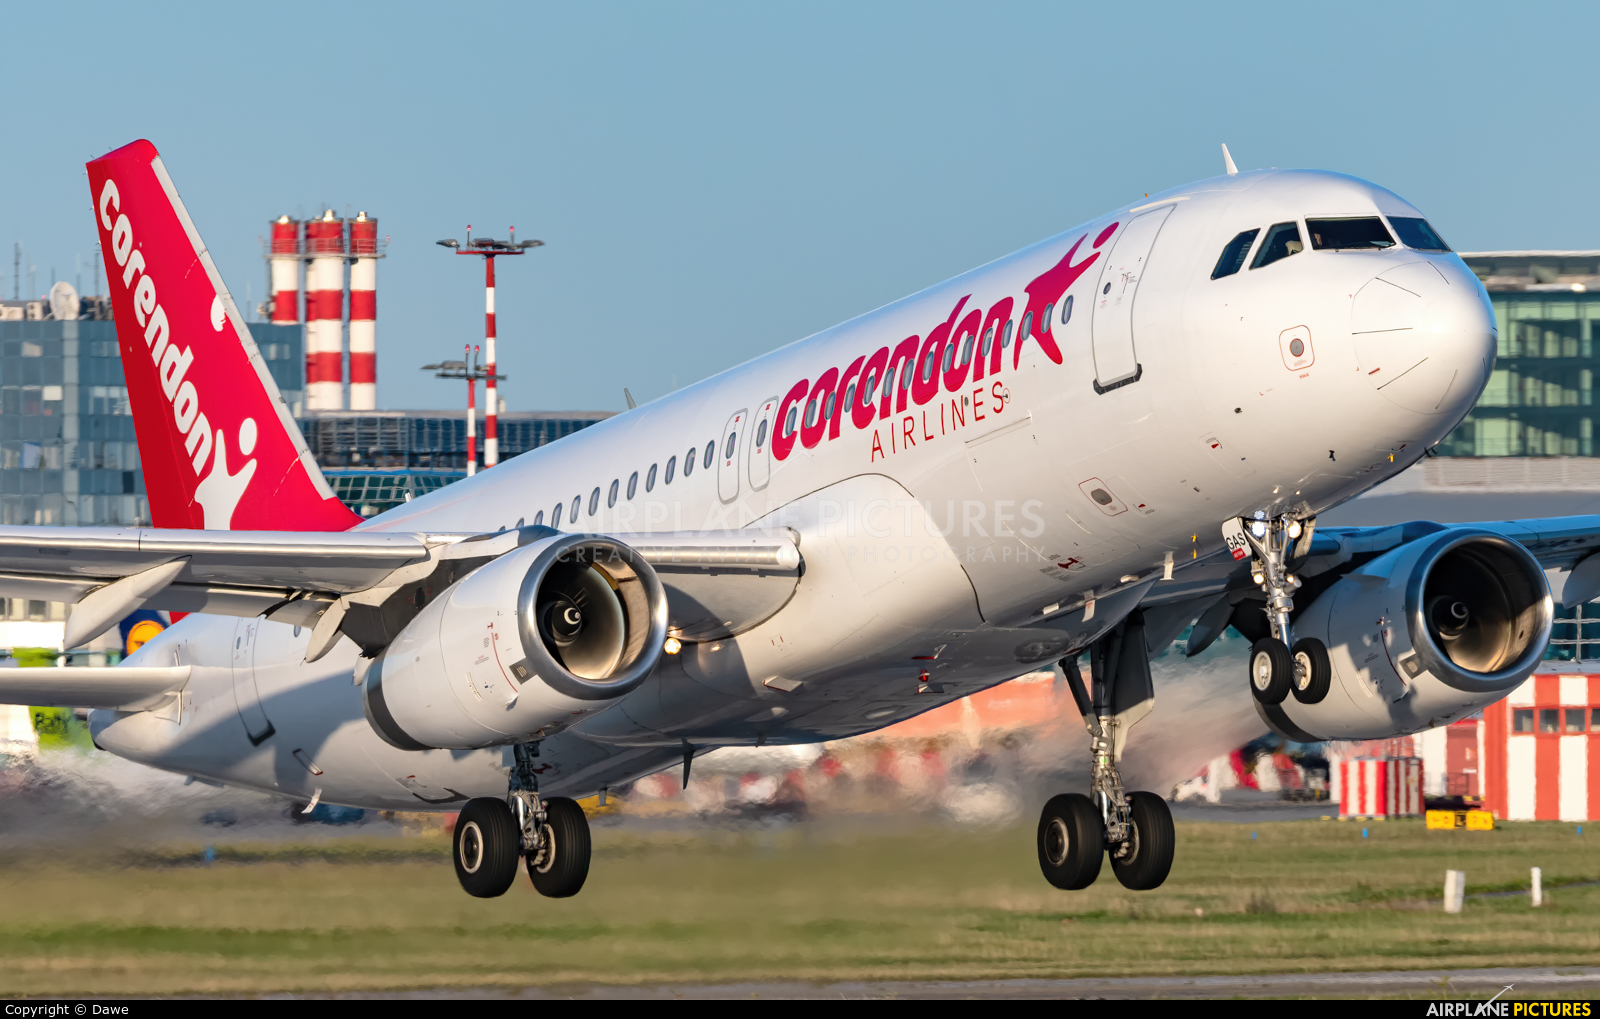 Corendon Airlines ZS-GAS aircraft at Prague - Václav Havel